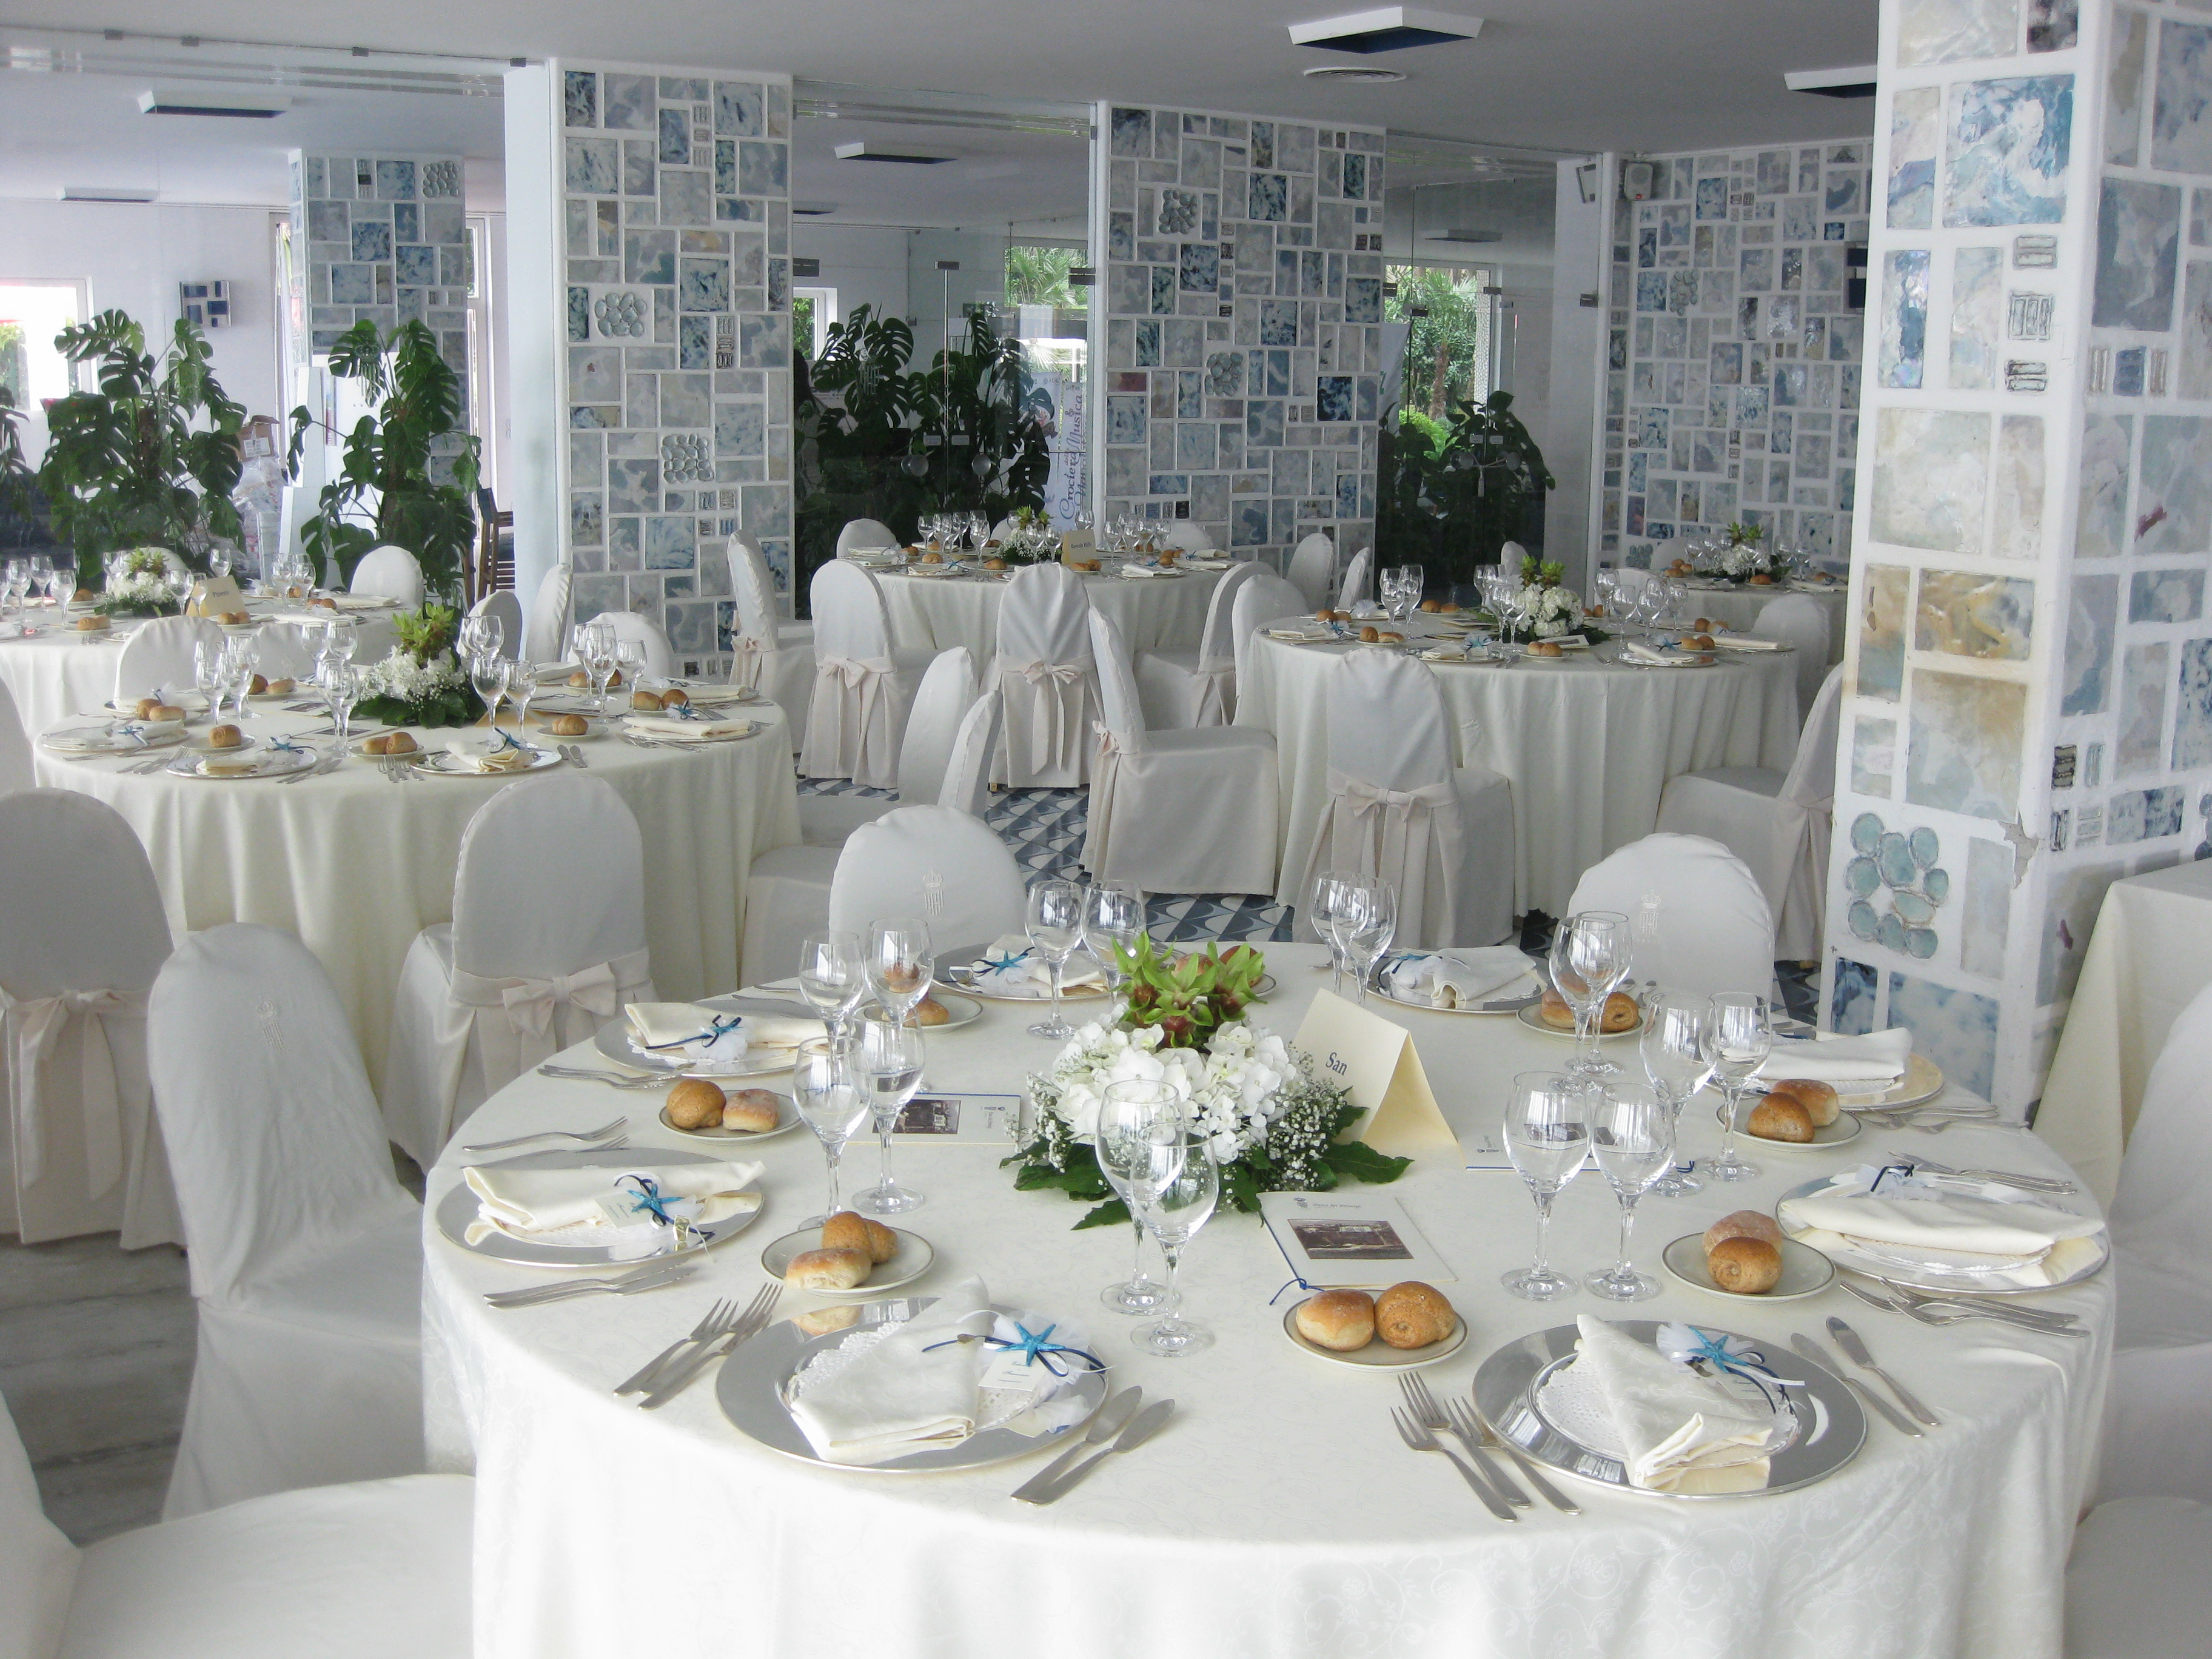 grand hotel parco dei principi matrimonio a sorrento. Black Bedroom Furniture Sets. Home Design Ideas